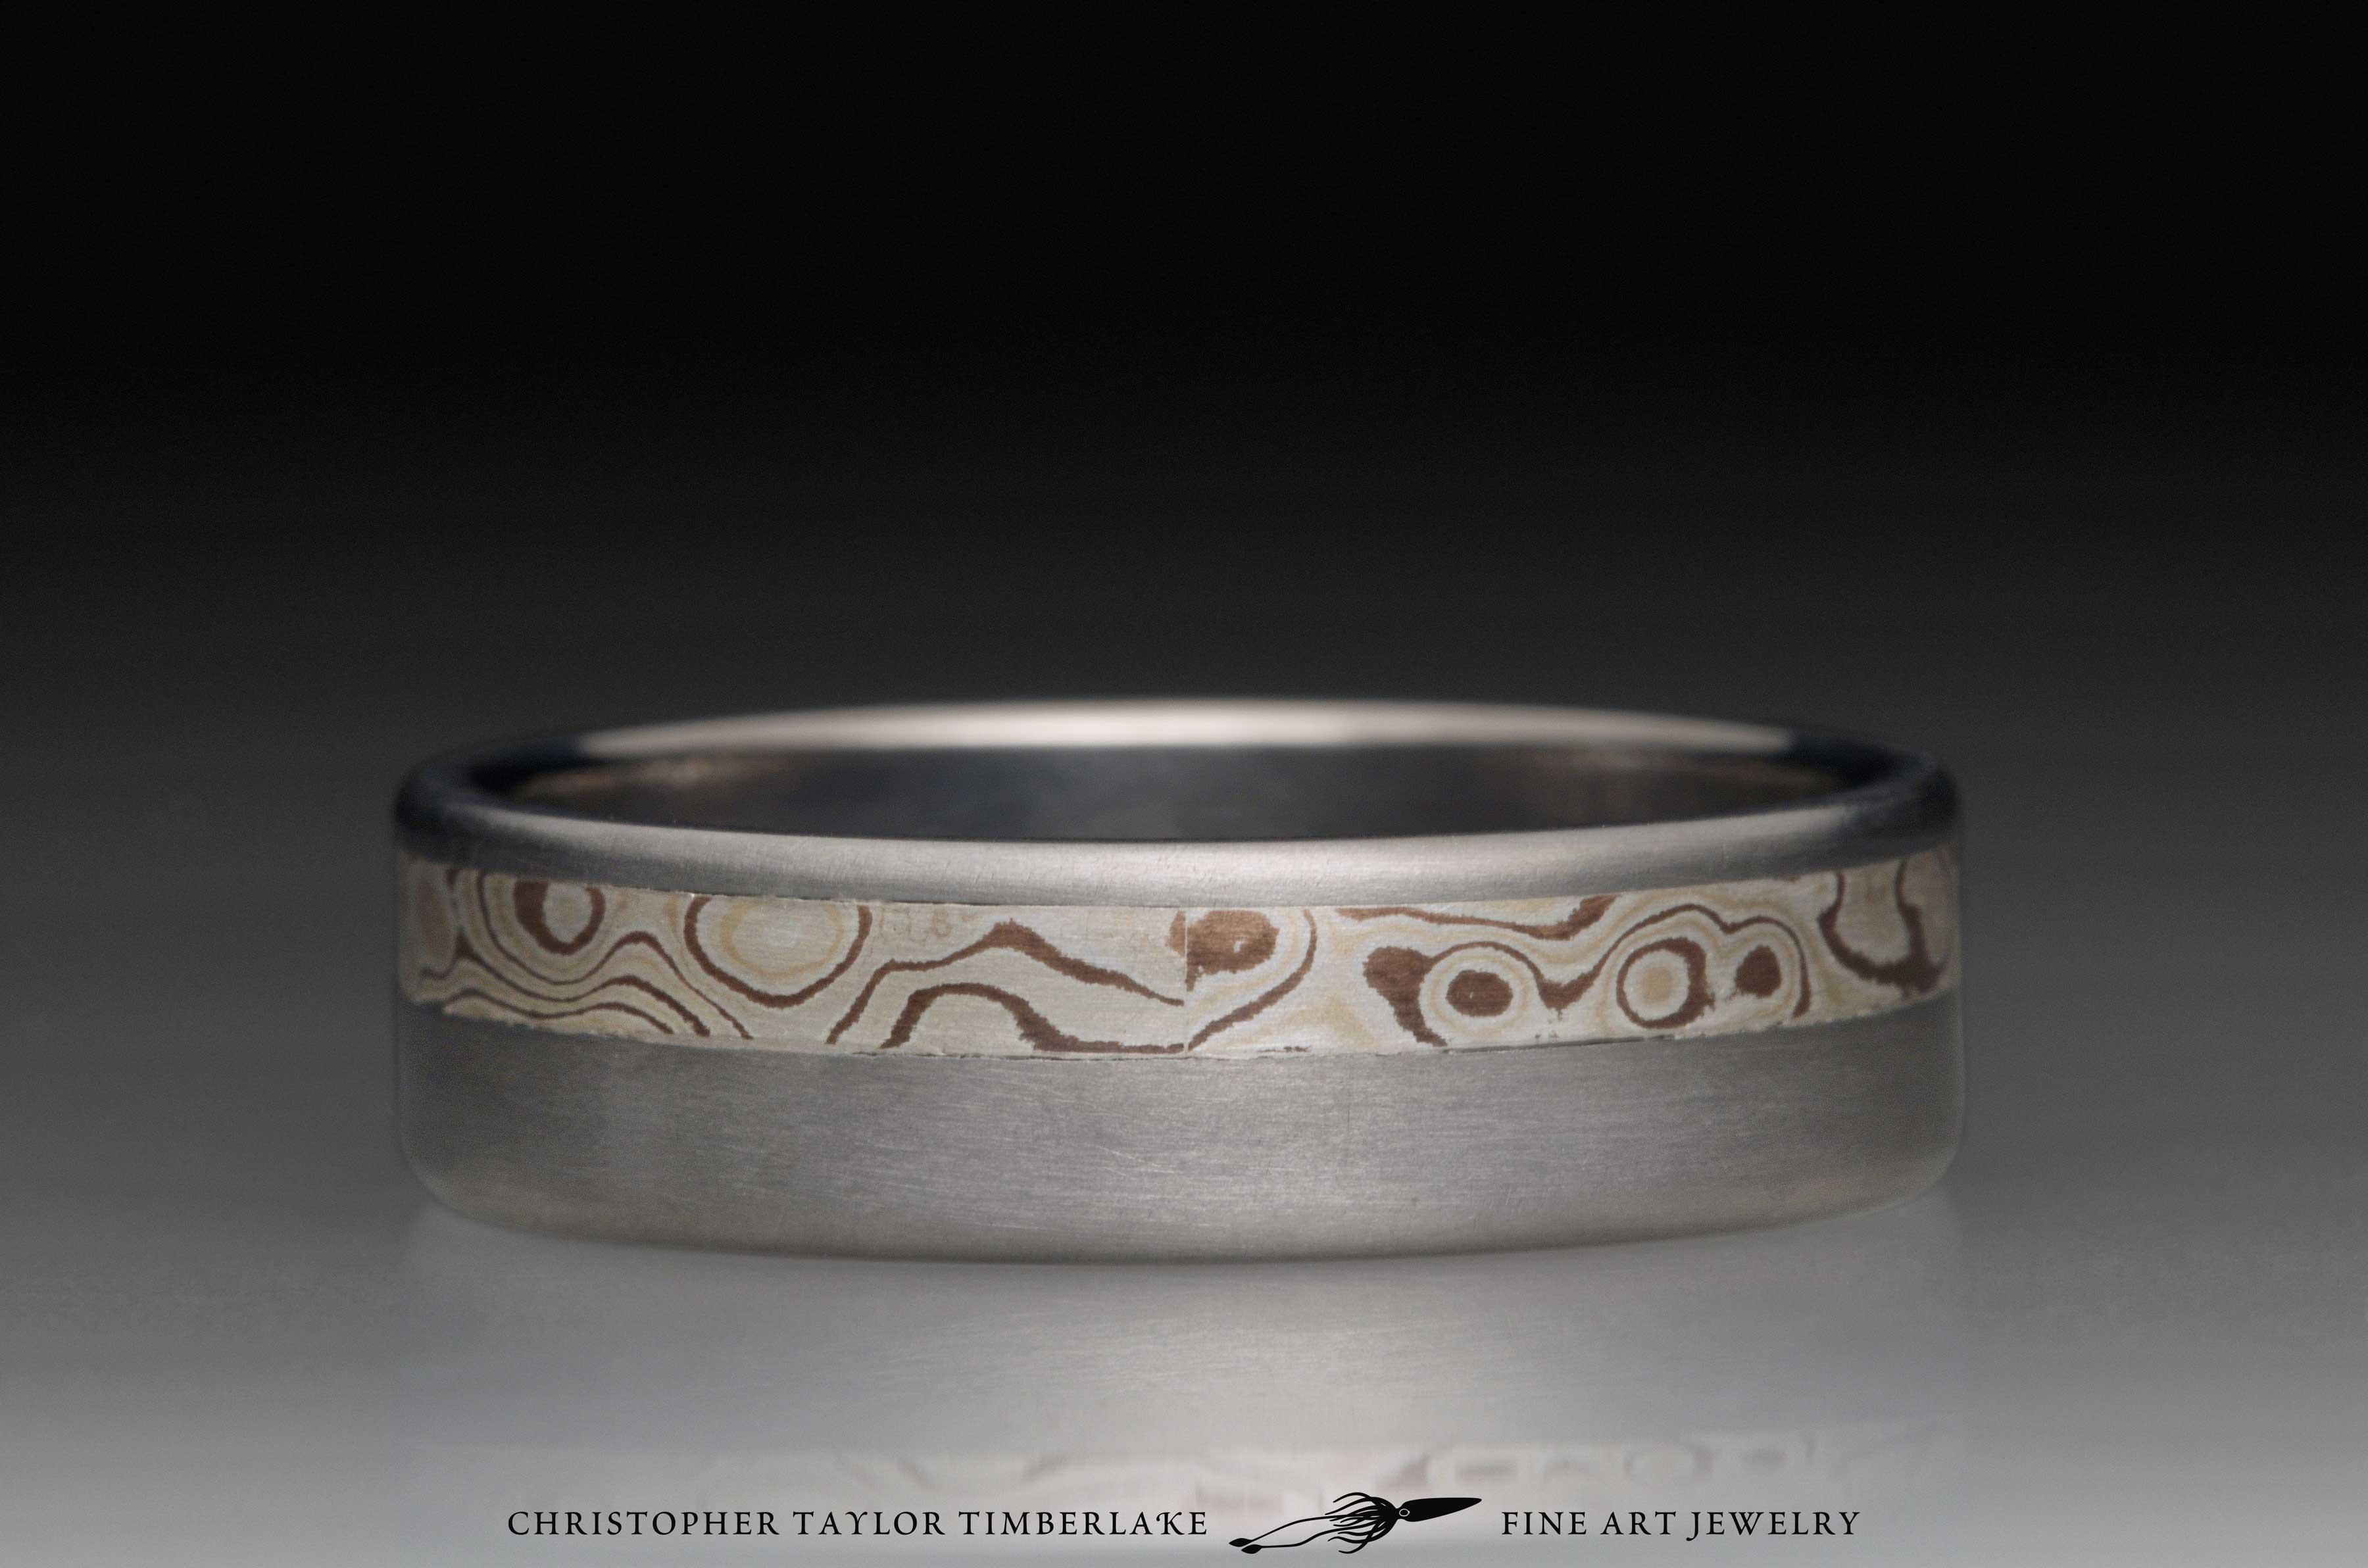 Mokume gane sterling silver, shakudo, and kogane inlay channel in titanium, 6.5mm (3.25-2.25-1) 3